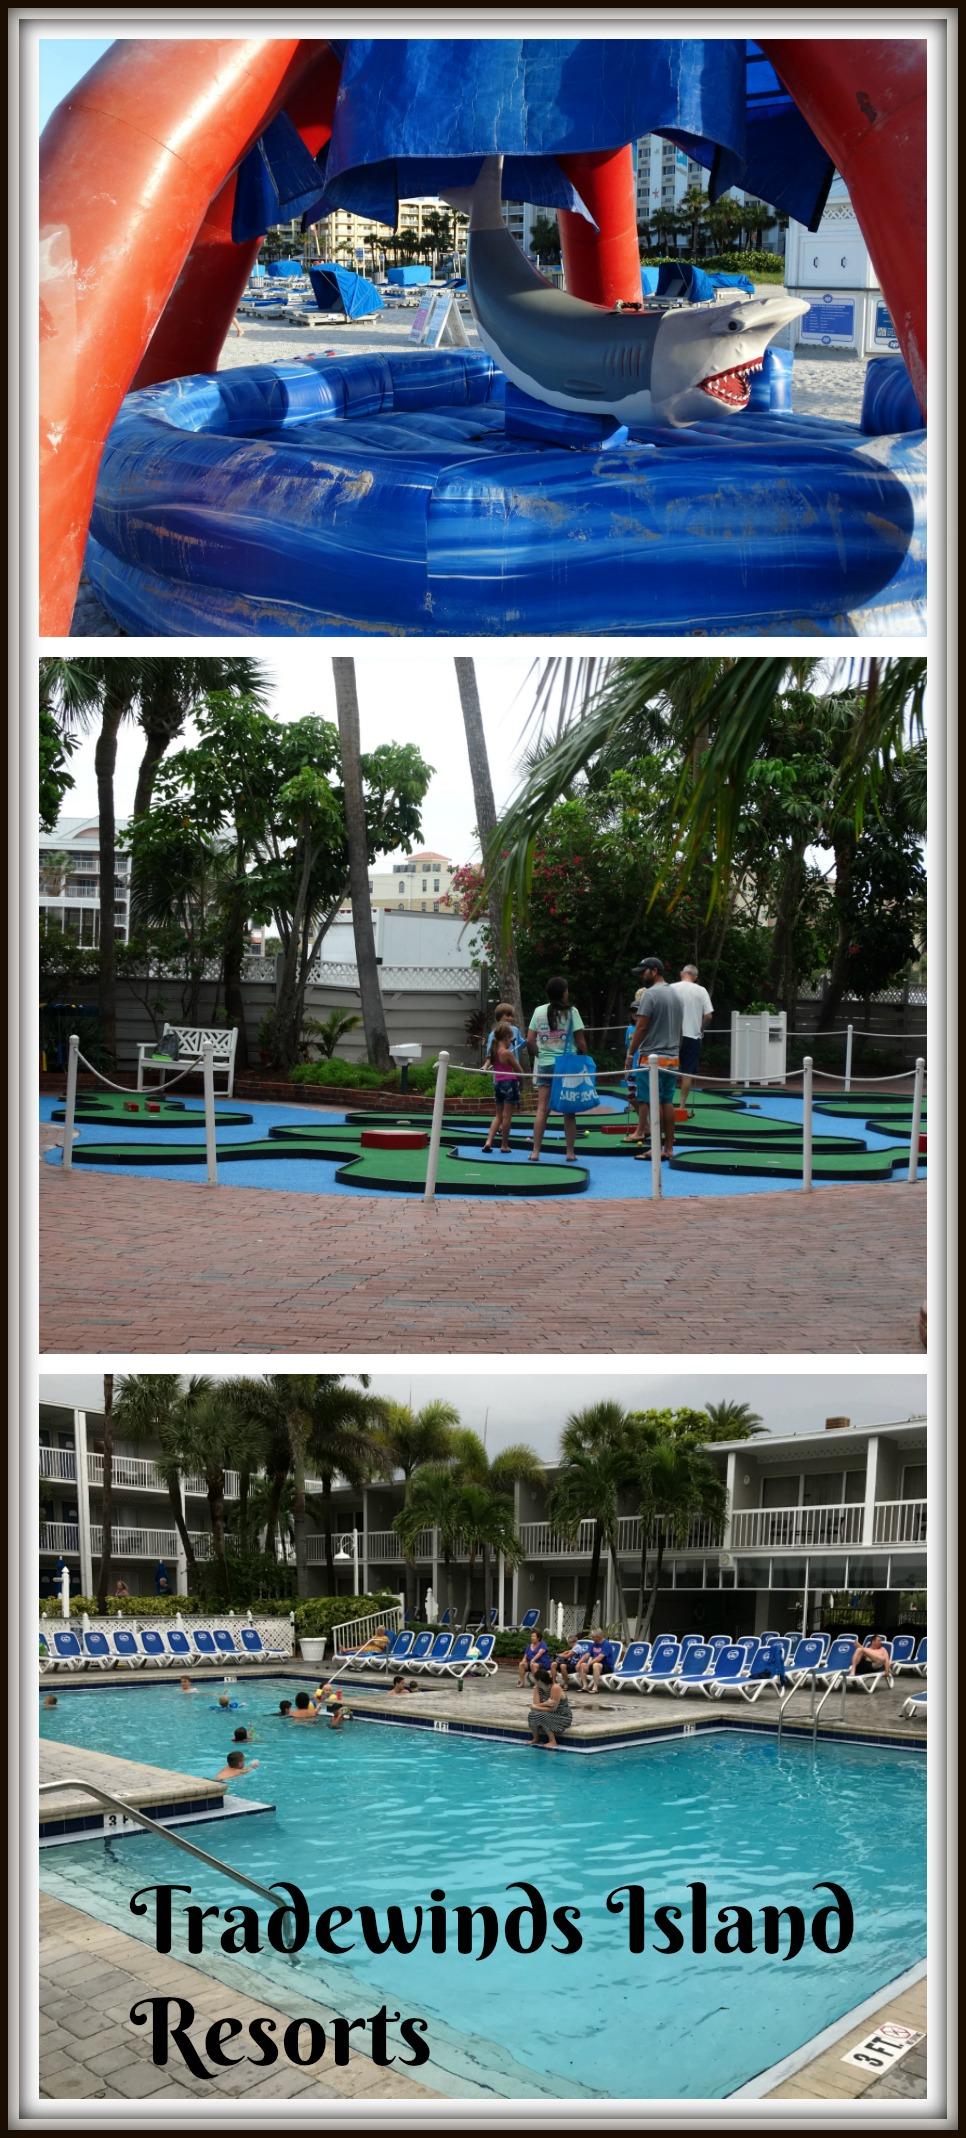 Tradewinds_Island_Resorts